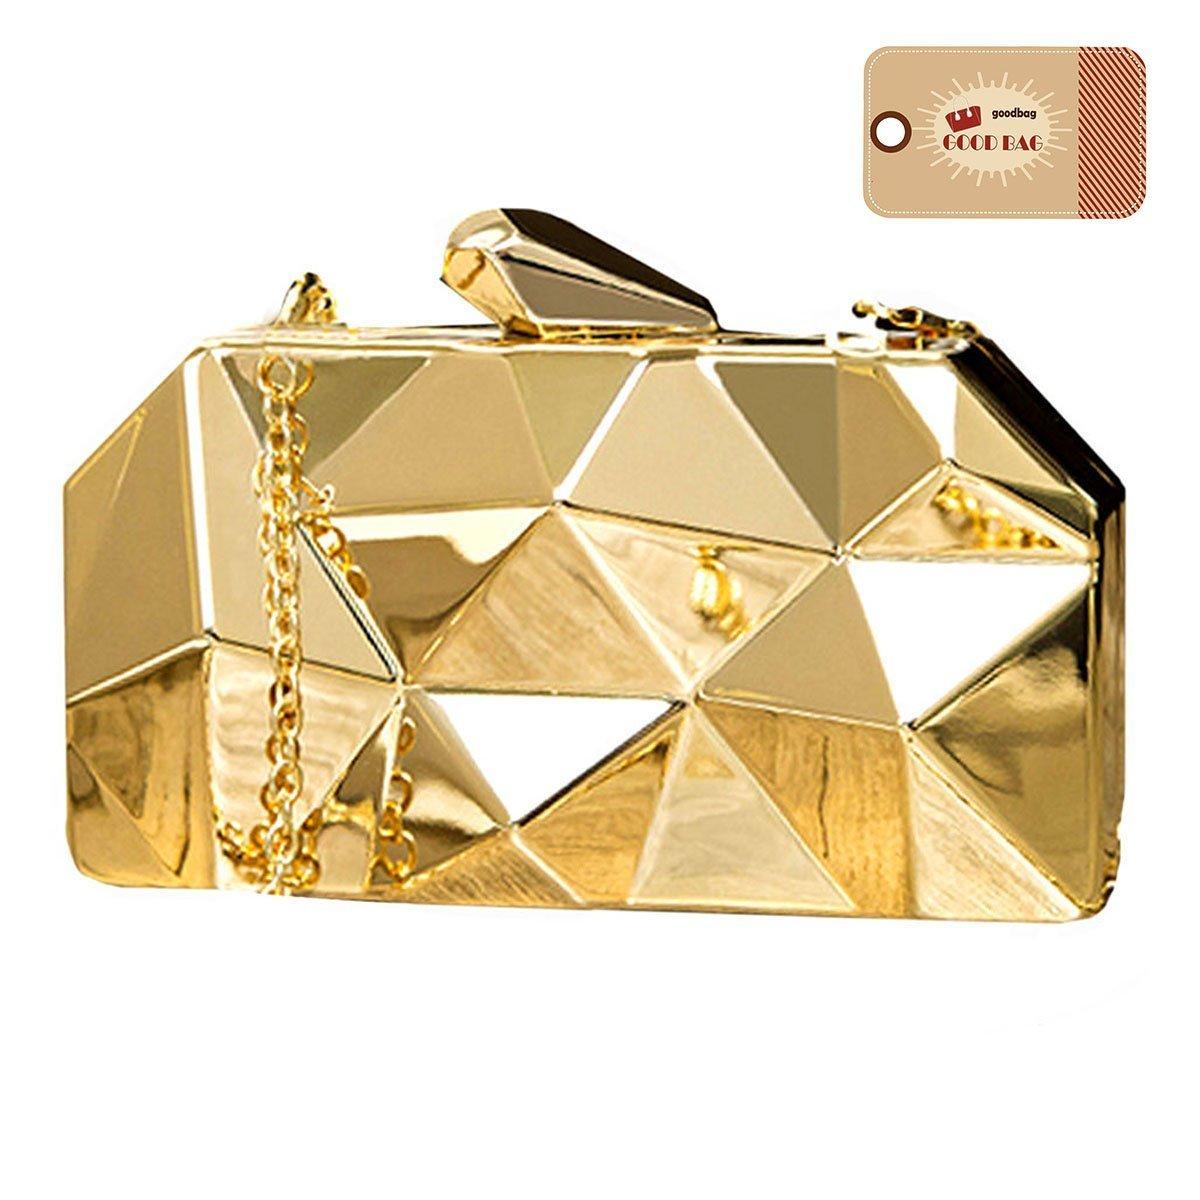 Goodbag Boutique Women Lattice Pattern Metal Handbag Girl Diamond Clutch Purse Chain Mini Shoulder Bag Gold